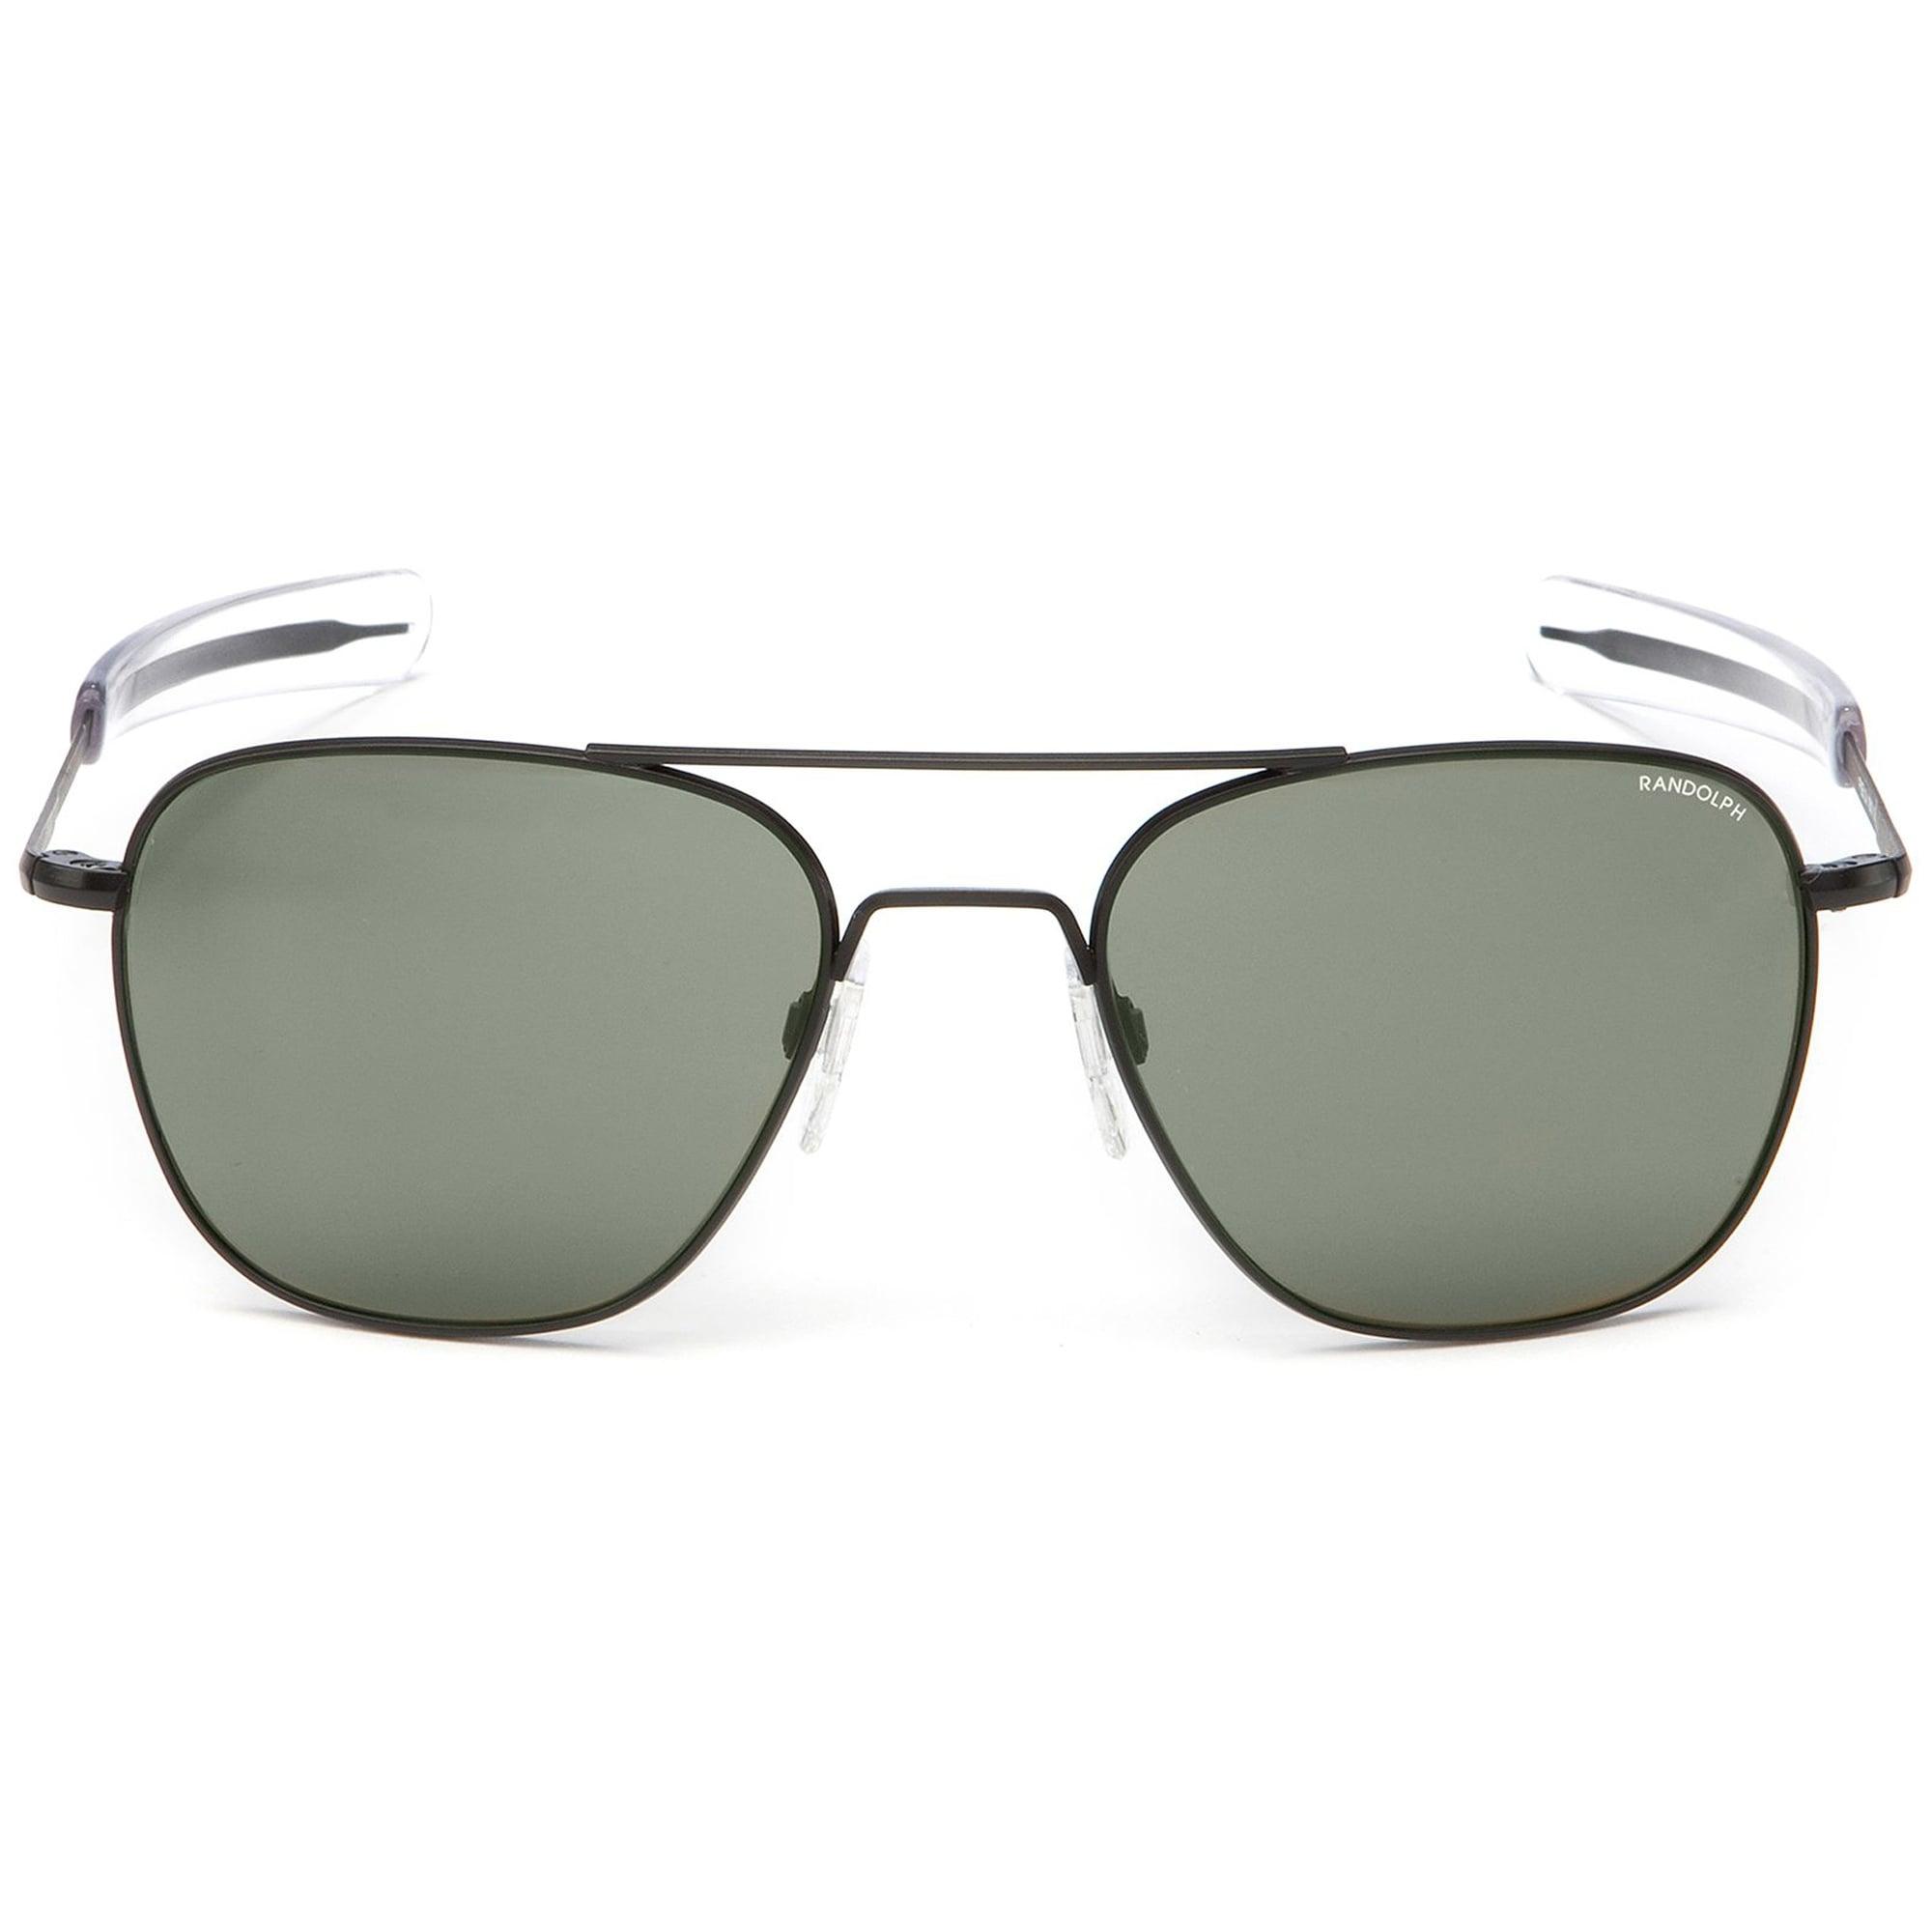 409f0f17a3 Randolph Sunglasses Black Matte Aviators